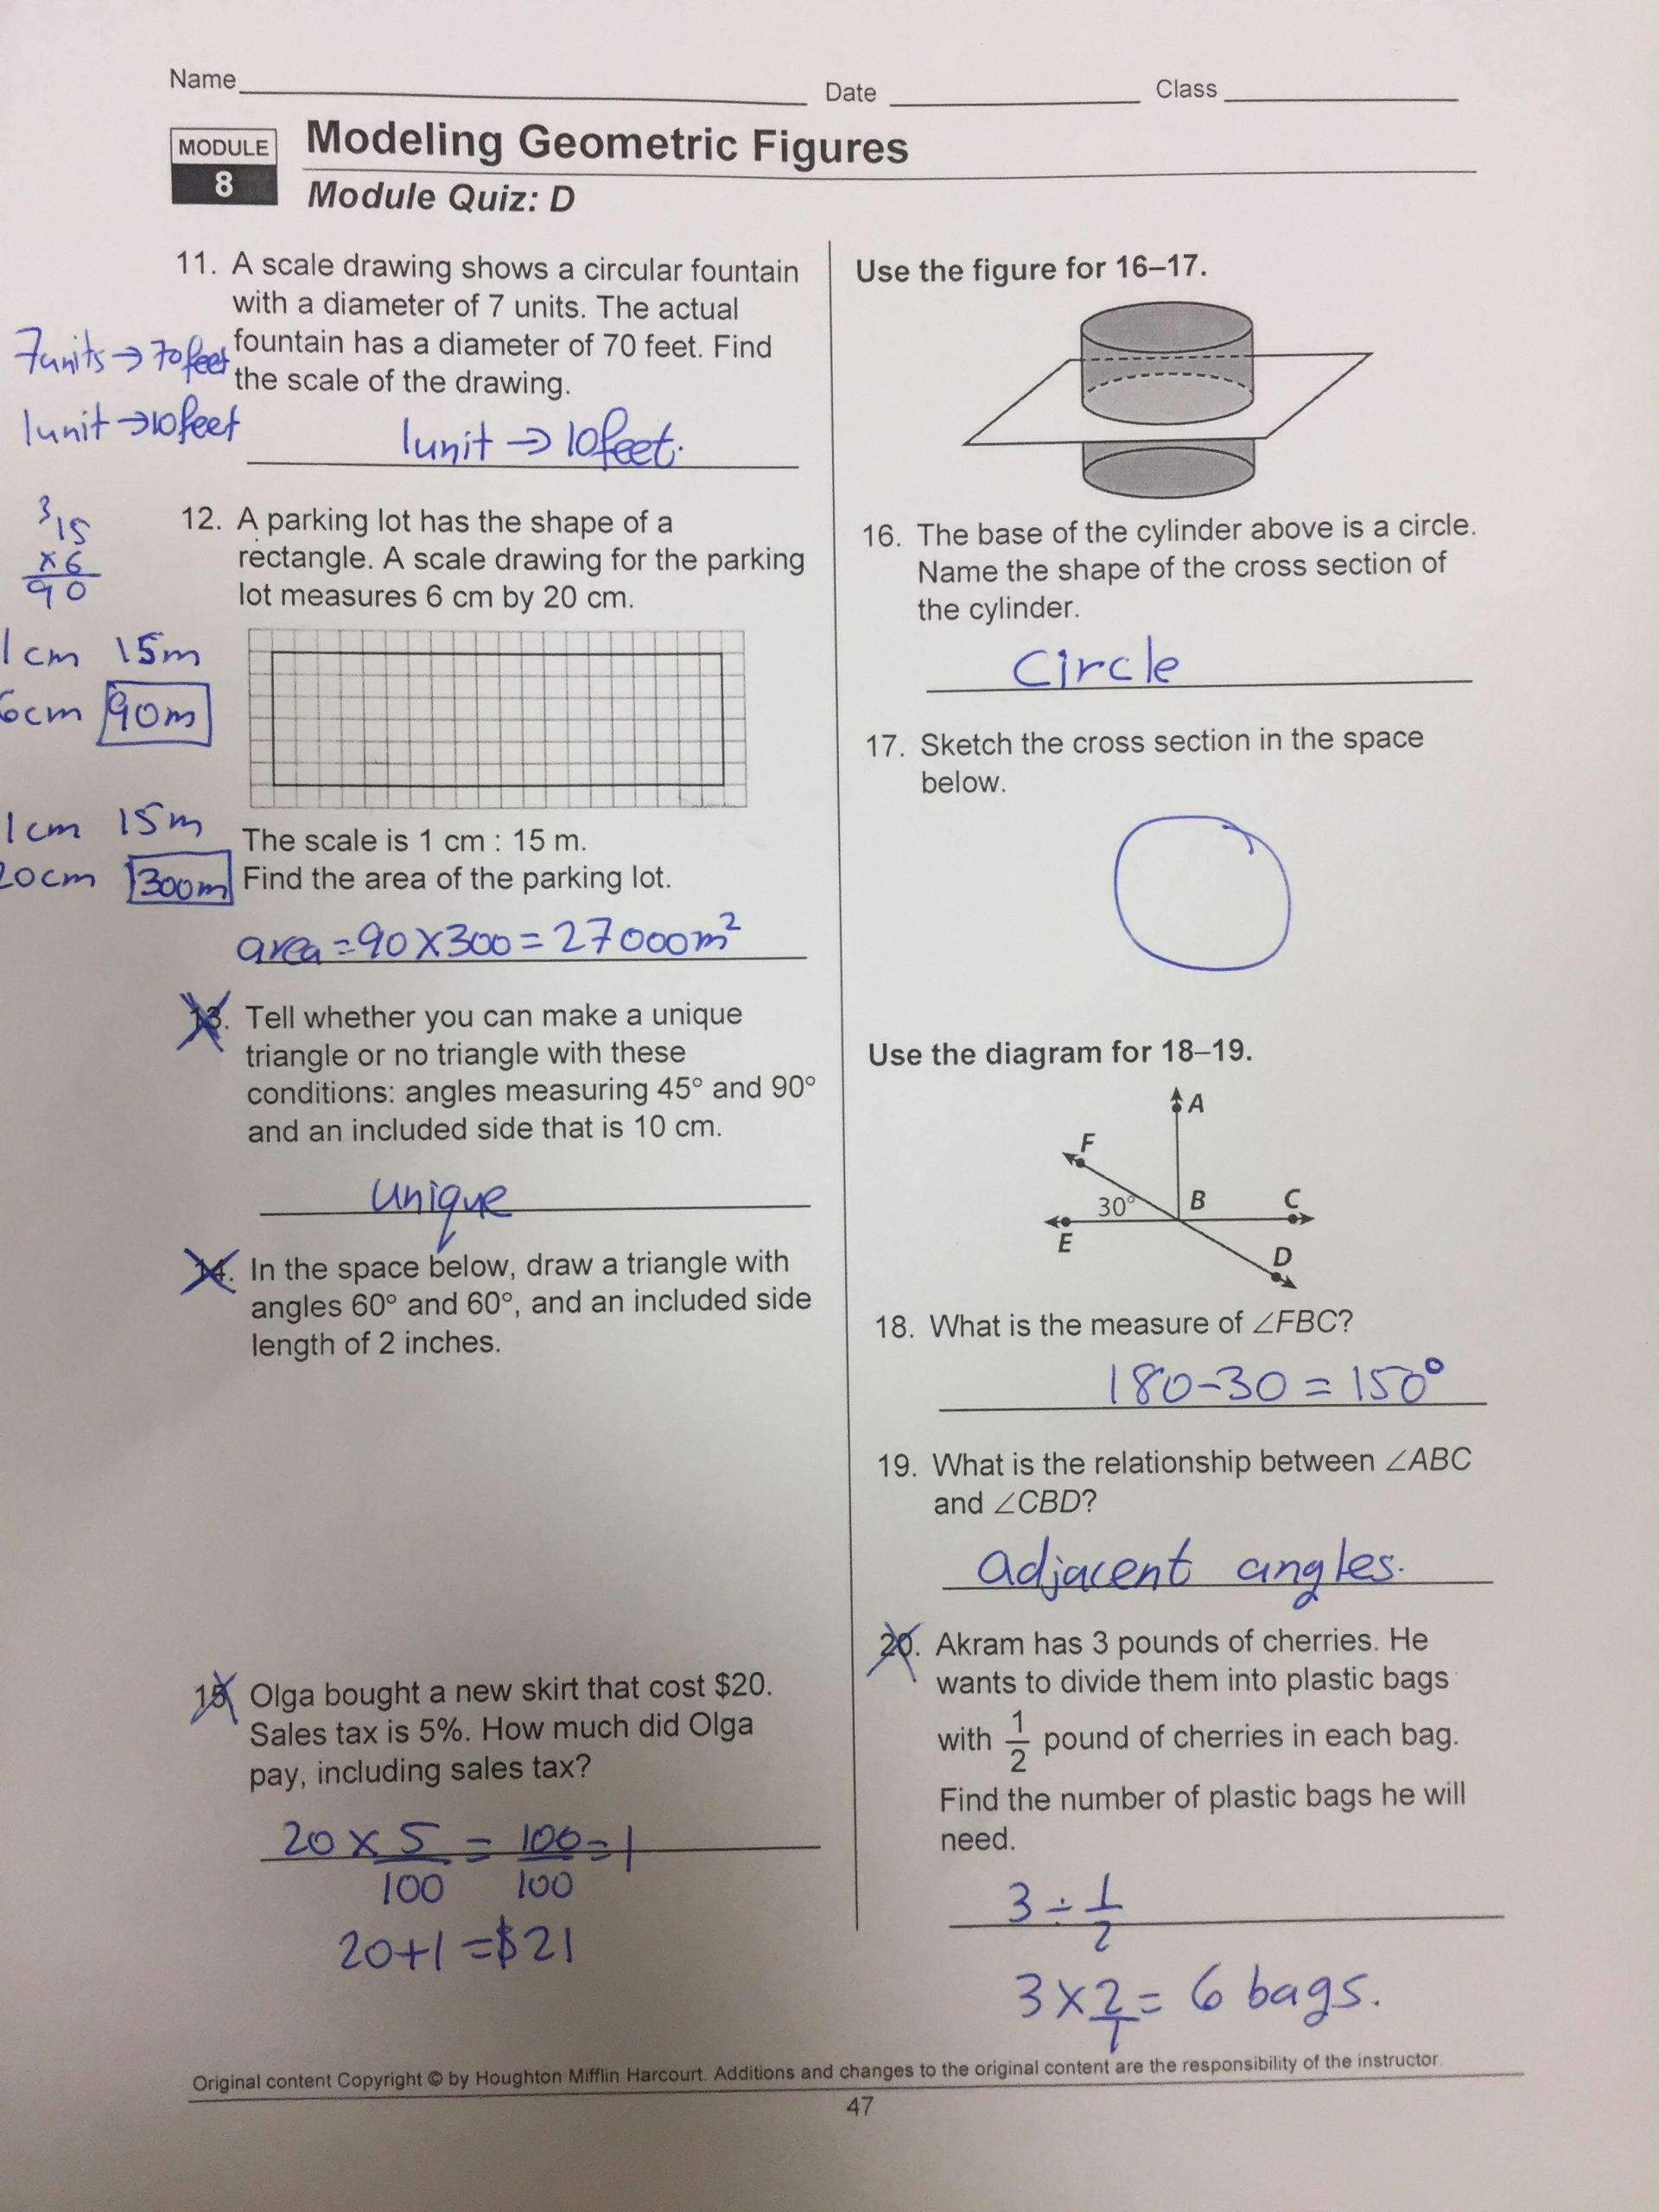 Cross Section Worksheet 7th Grade Math Mr Karim – Grade 7 Blog